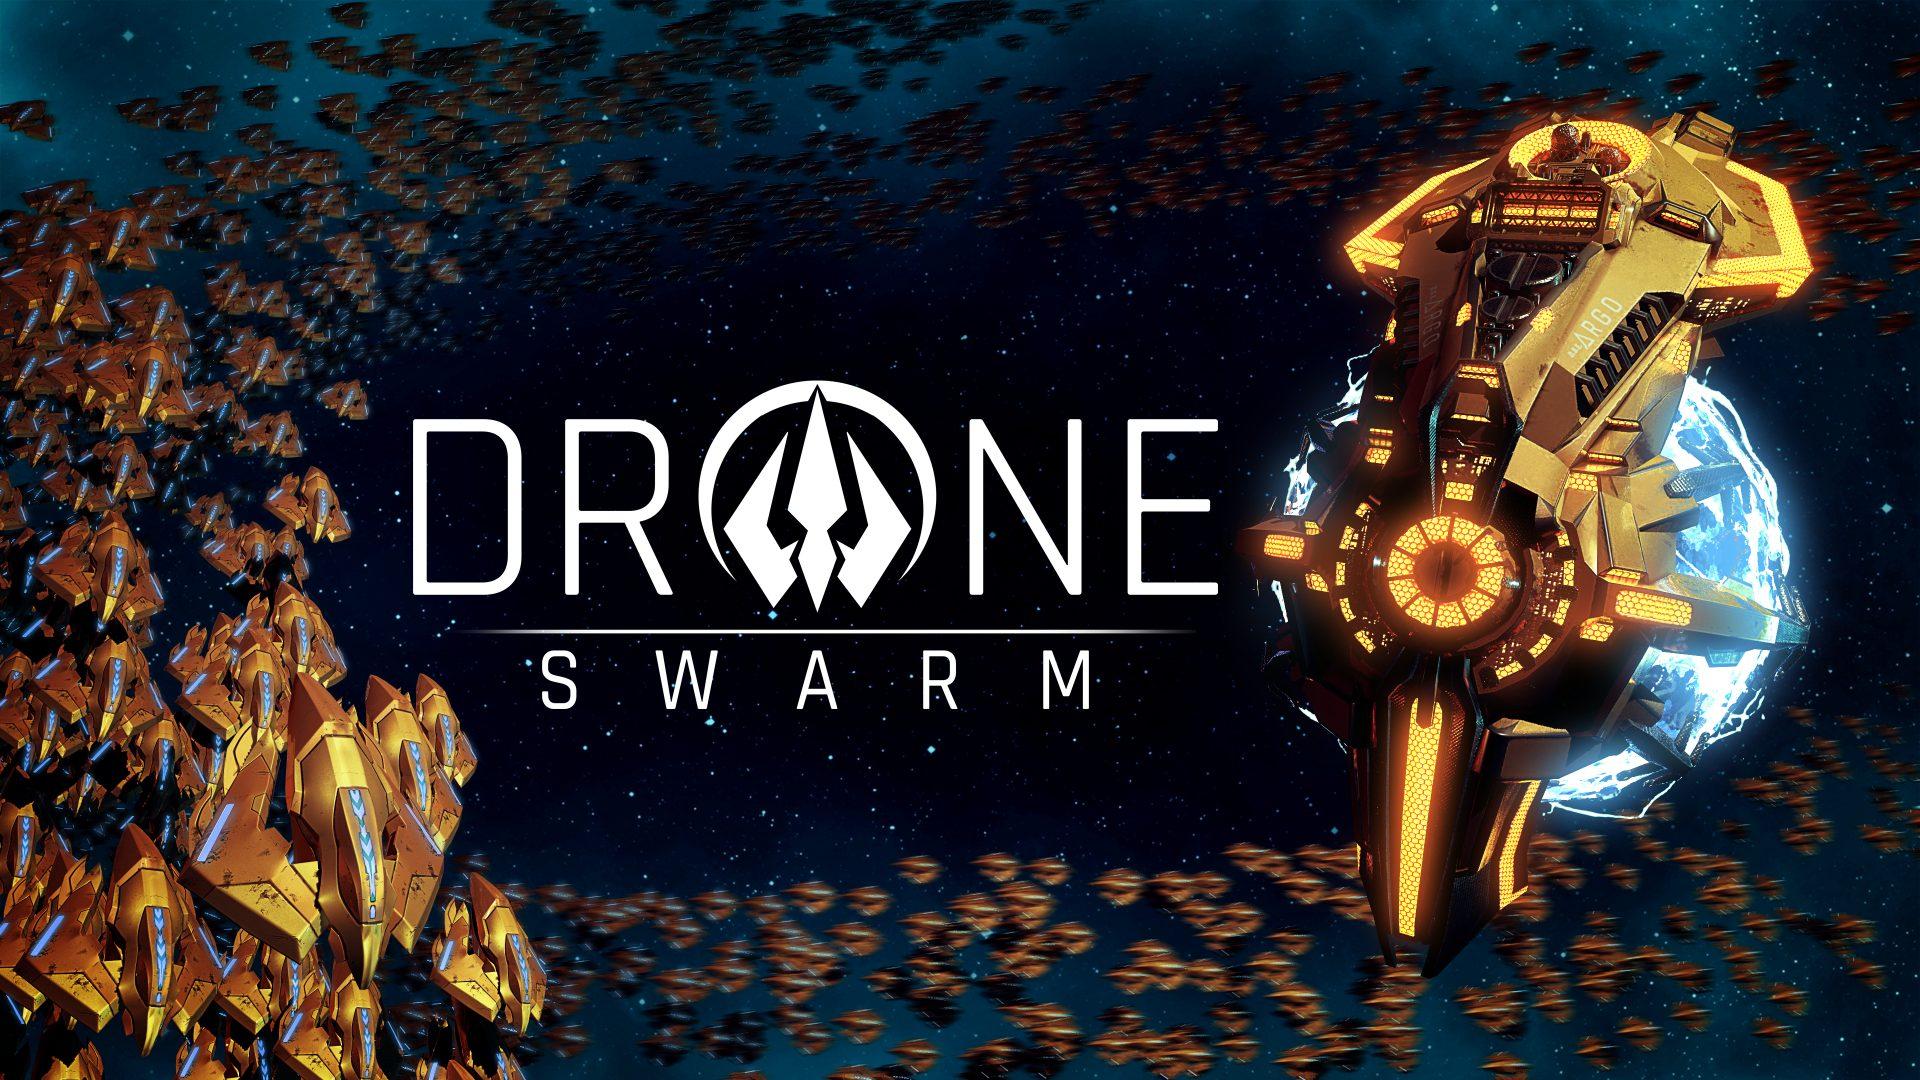 Drone Swarm Art